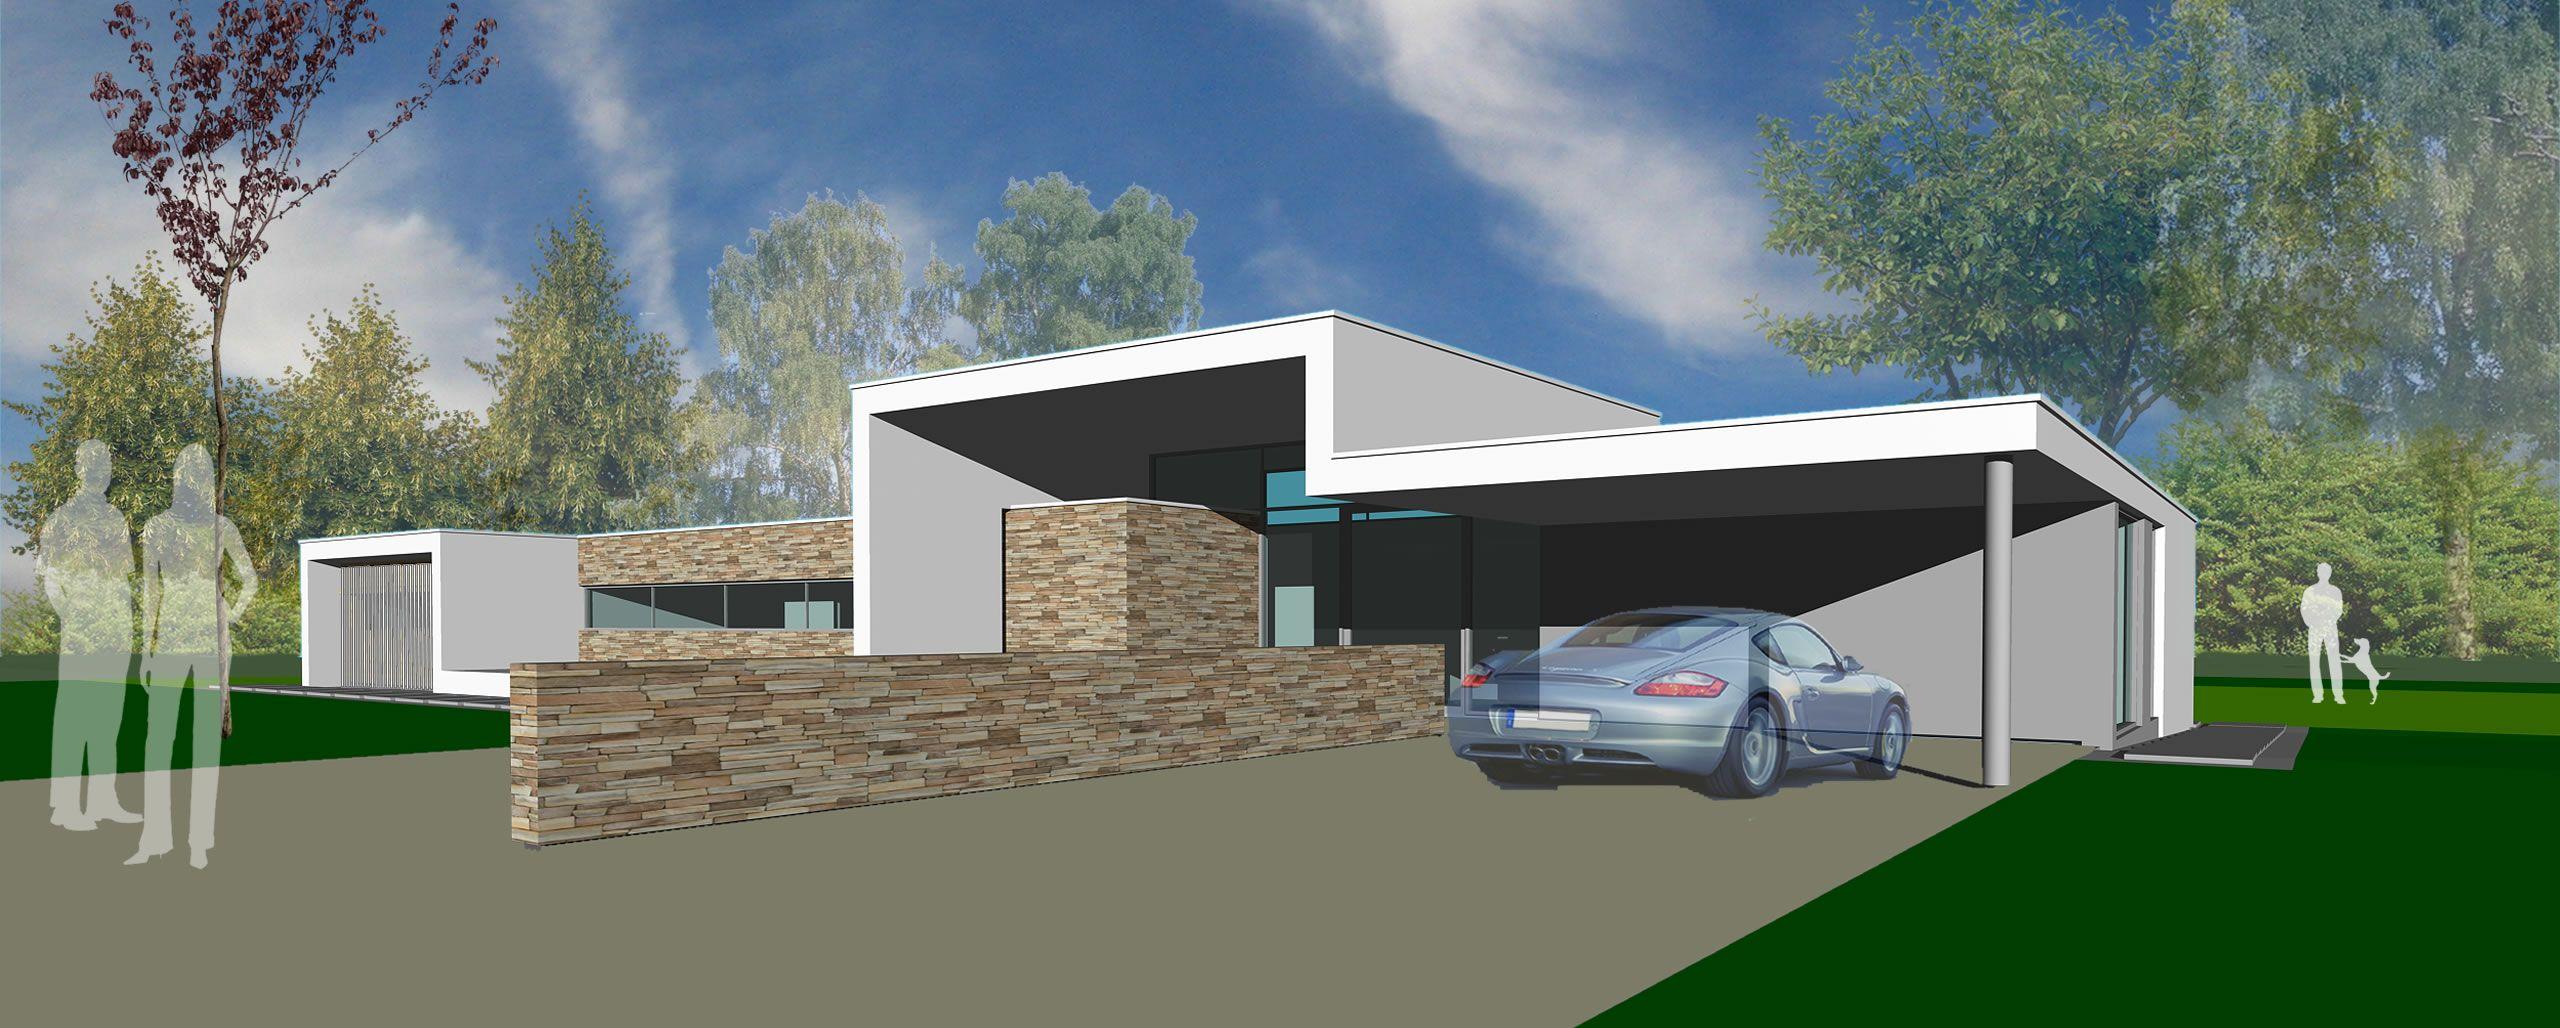 architect modern woning 2 hoog - Google zoeken | nieuwbouw ...